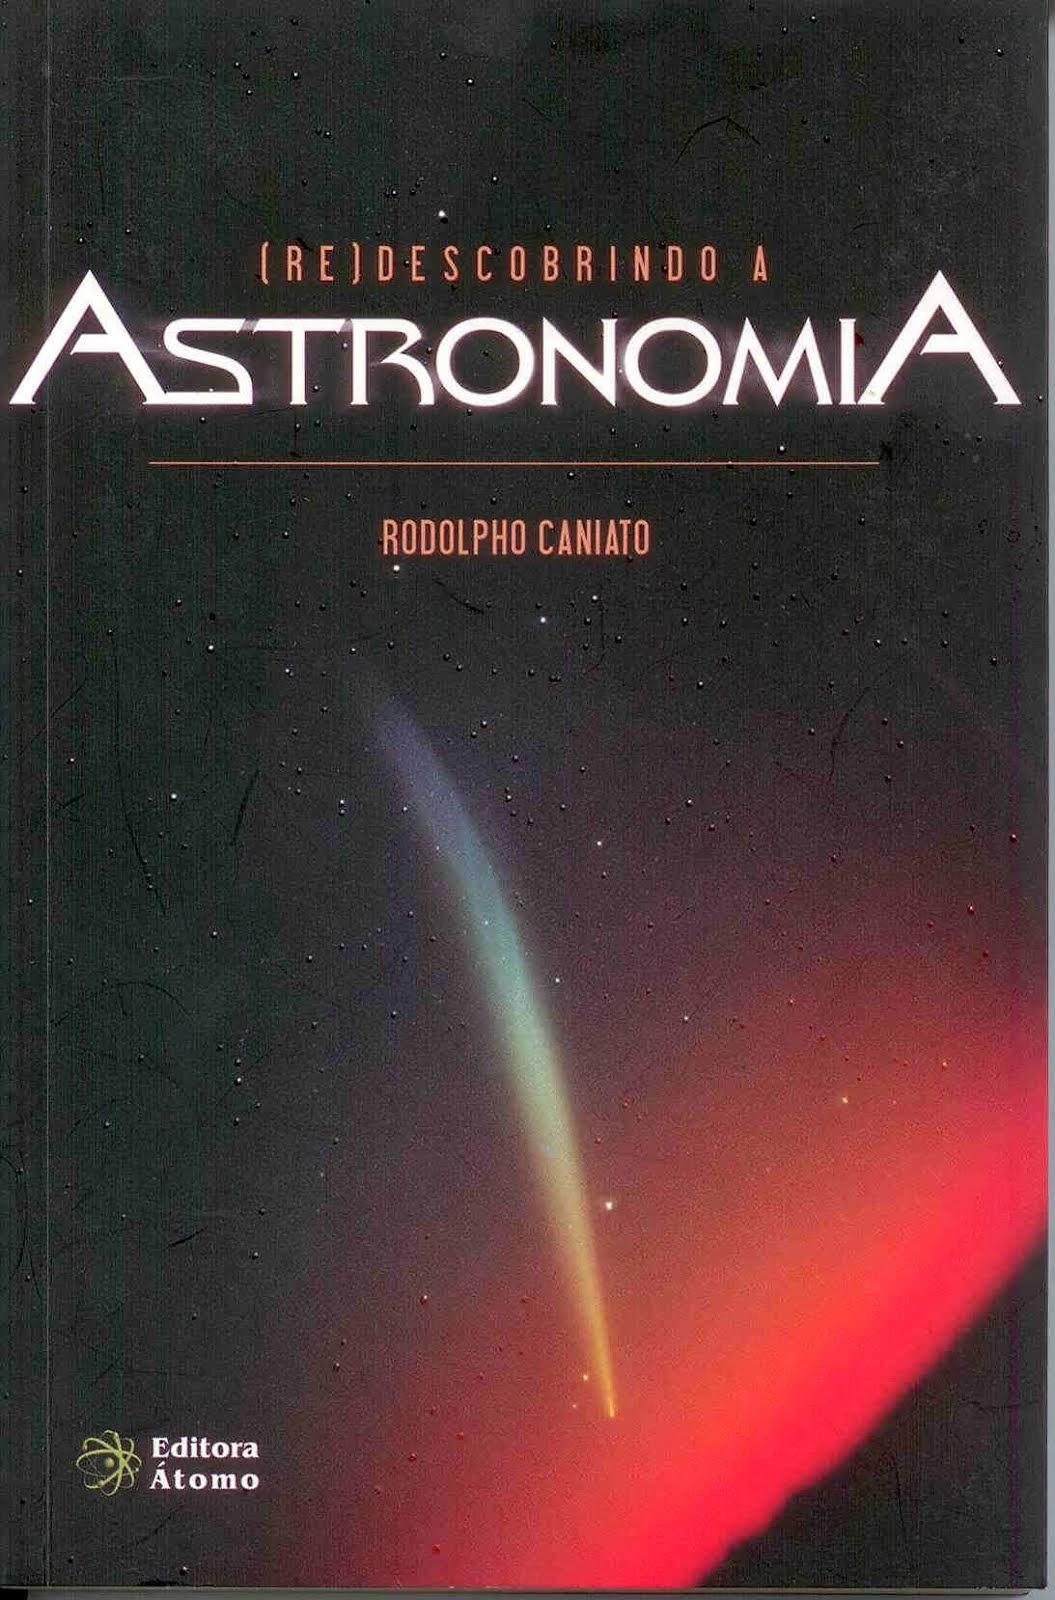 Redescobrindo a Astronomia